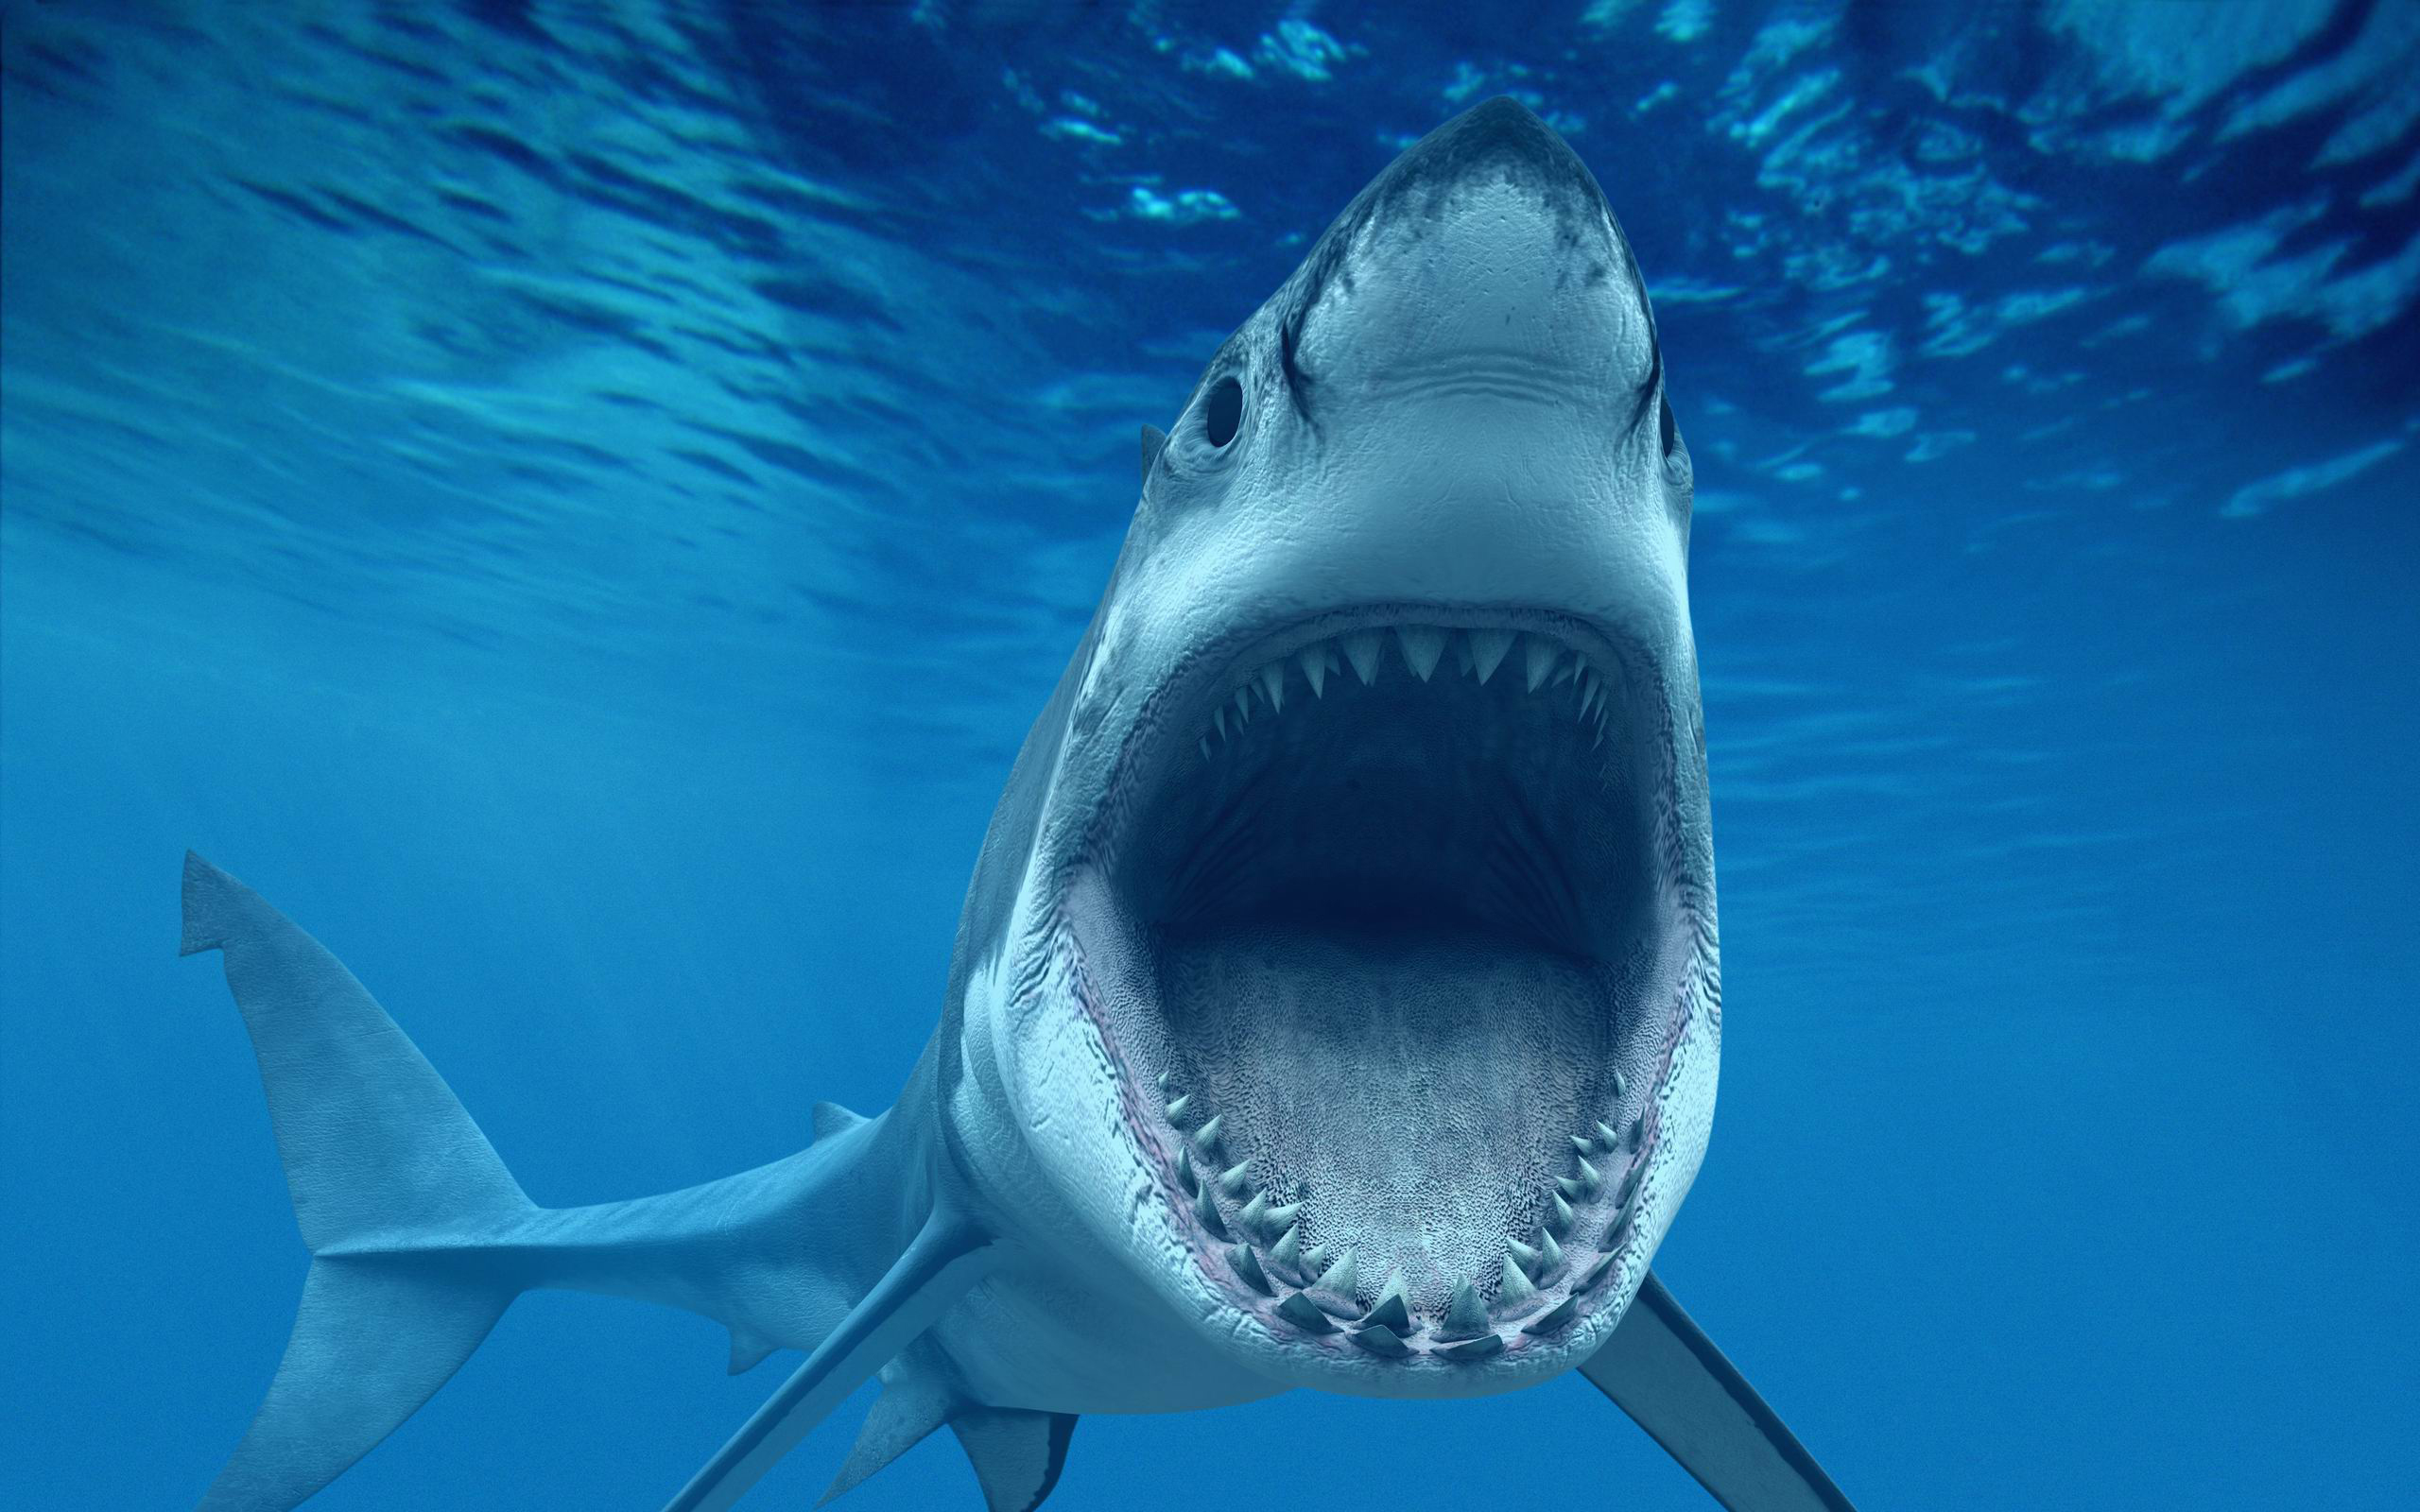 Shark tank clipart banner free library Shark Tank: Atlanta University Center Edition - Hypepotamus ... banner free library